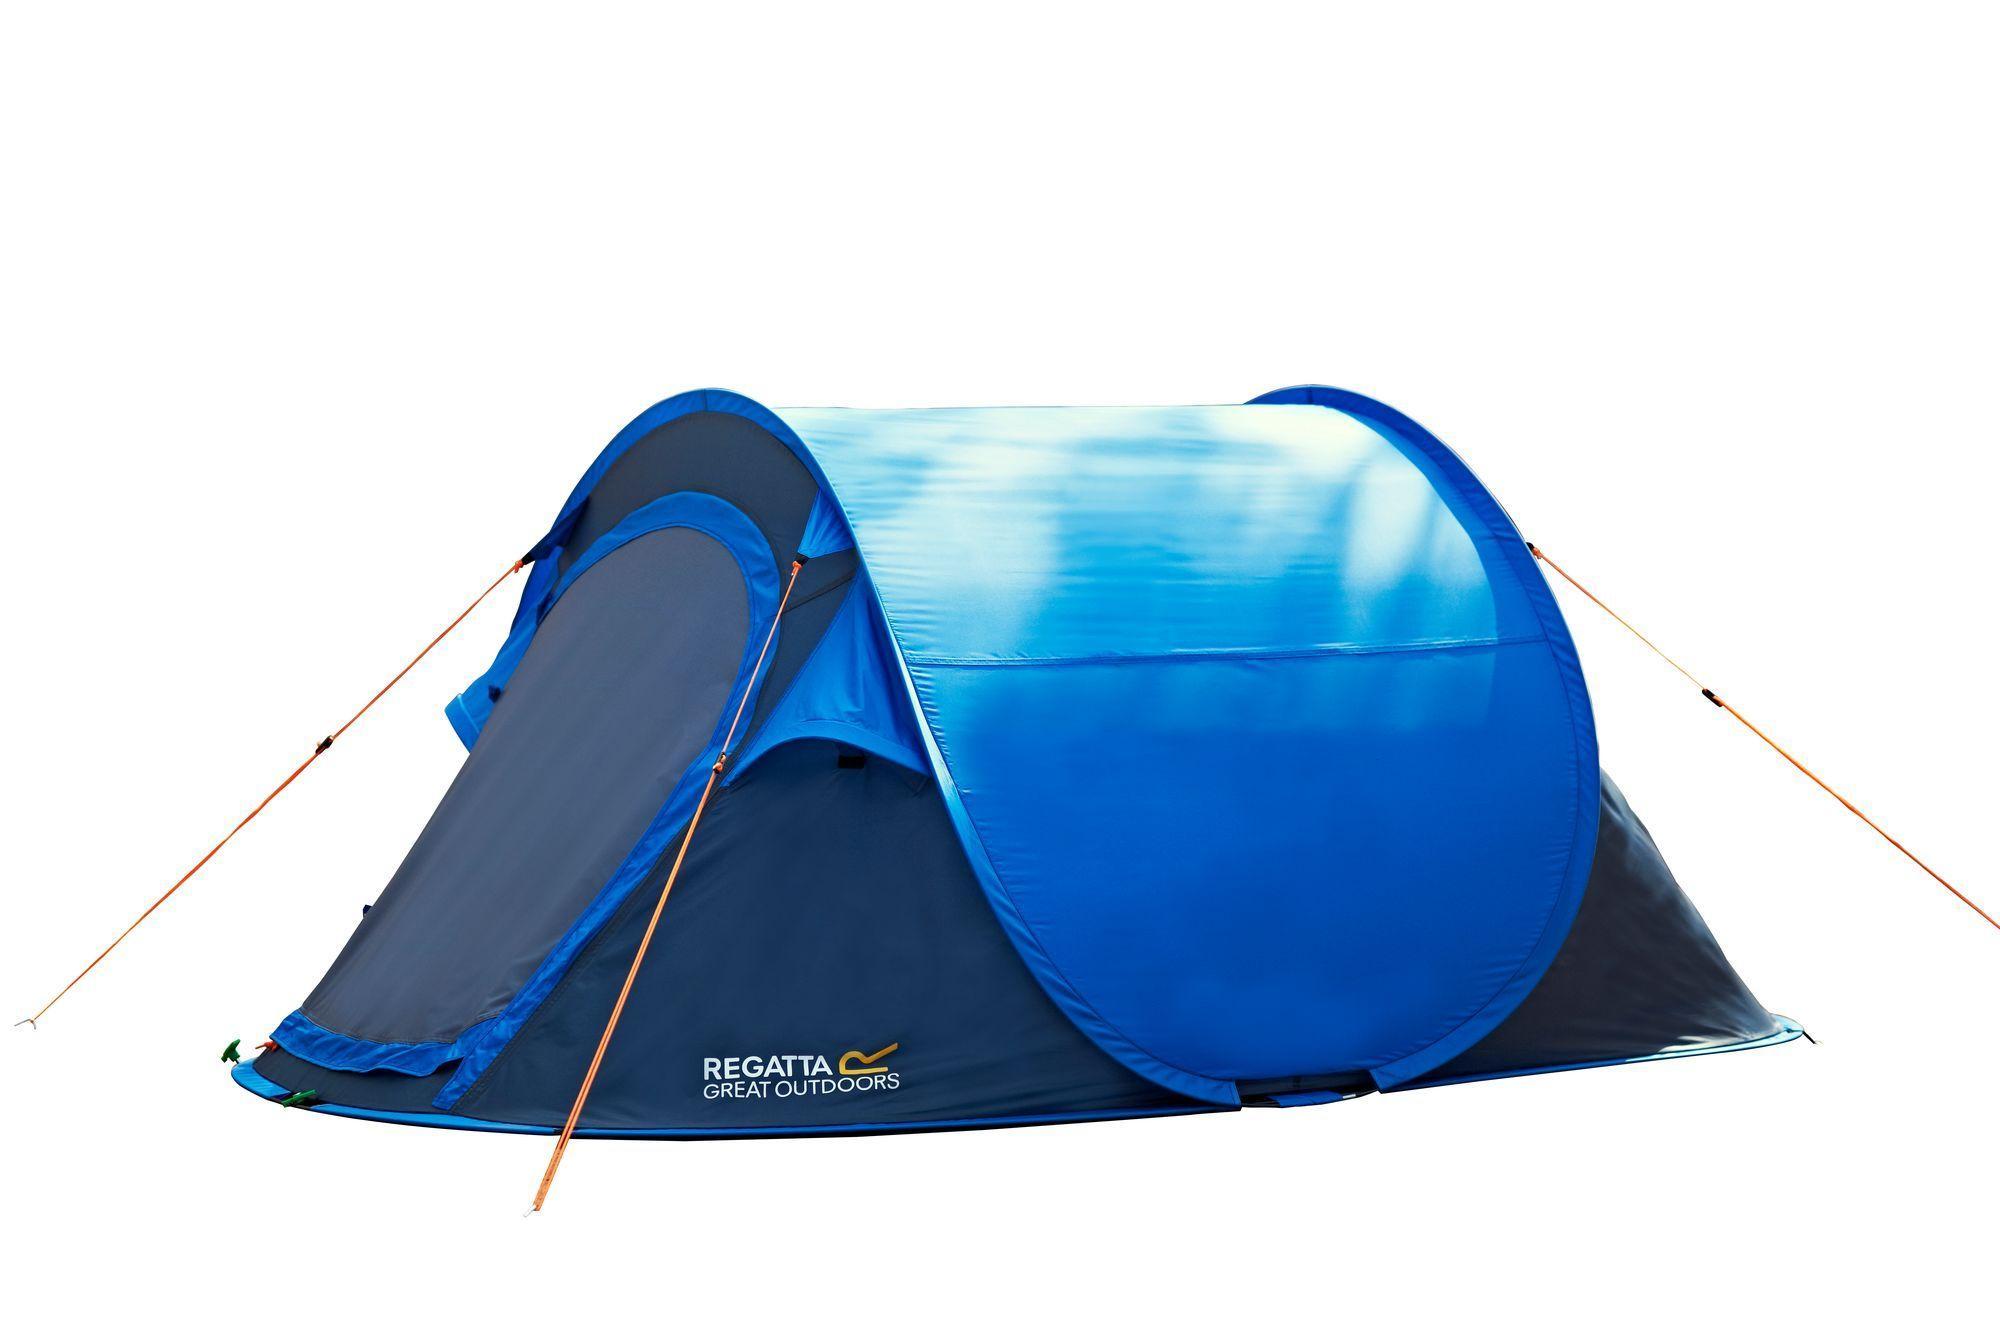 Regatta Waterproof Malawi Unisex Outdoor Pop-Up Tent